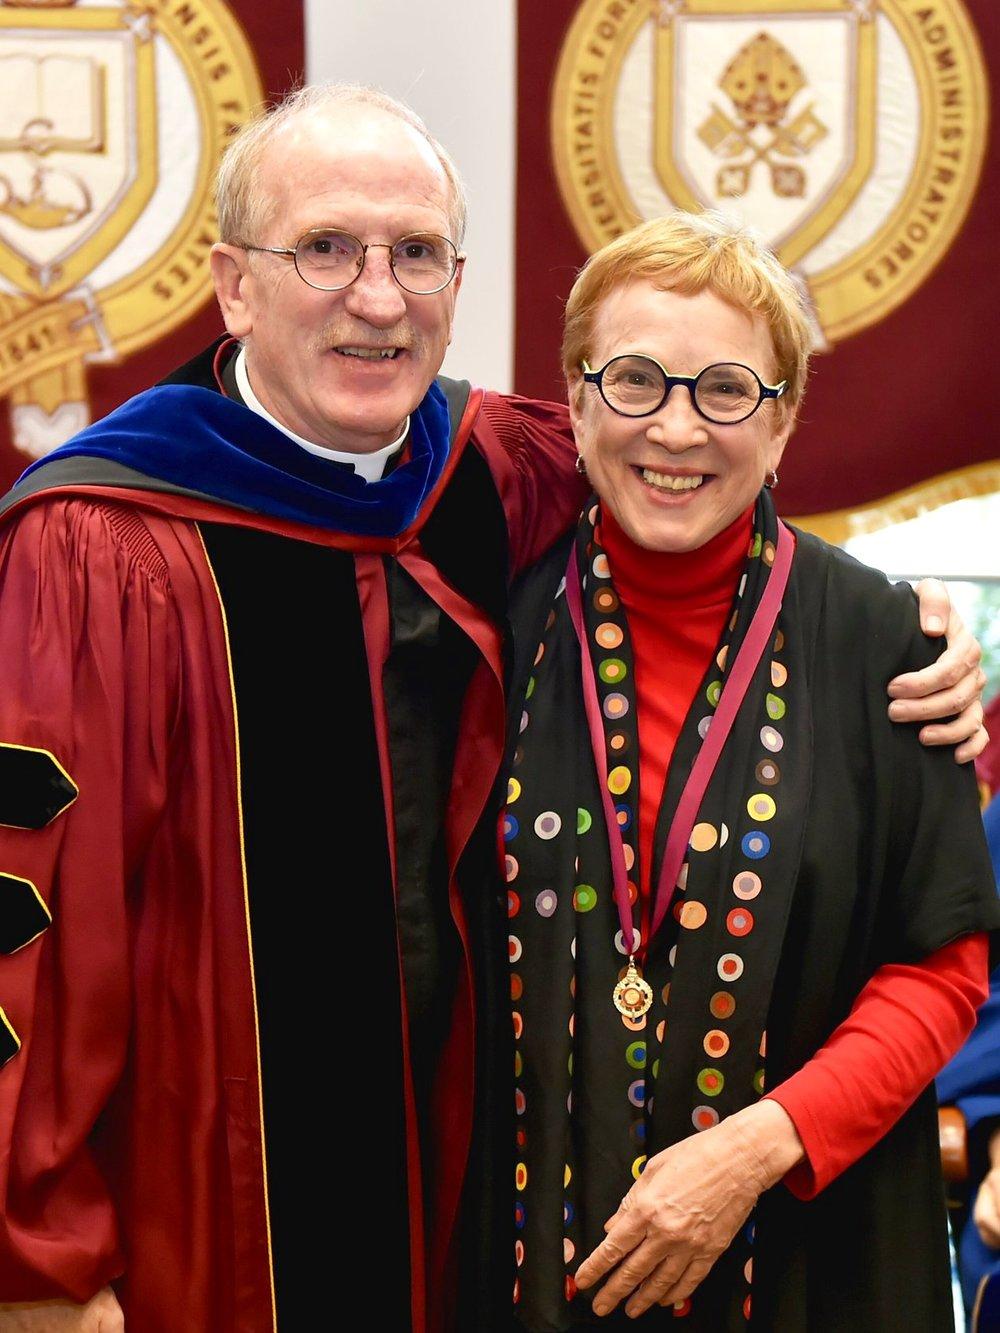 President McShane with Professor Stone